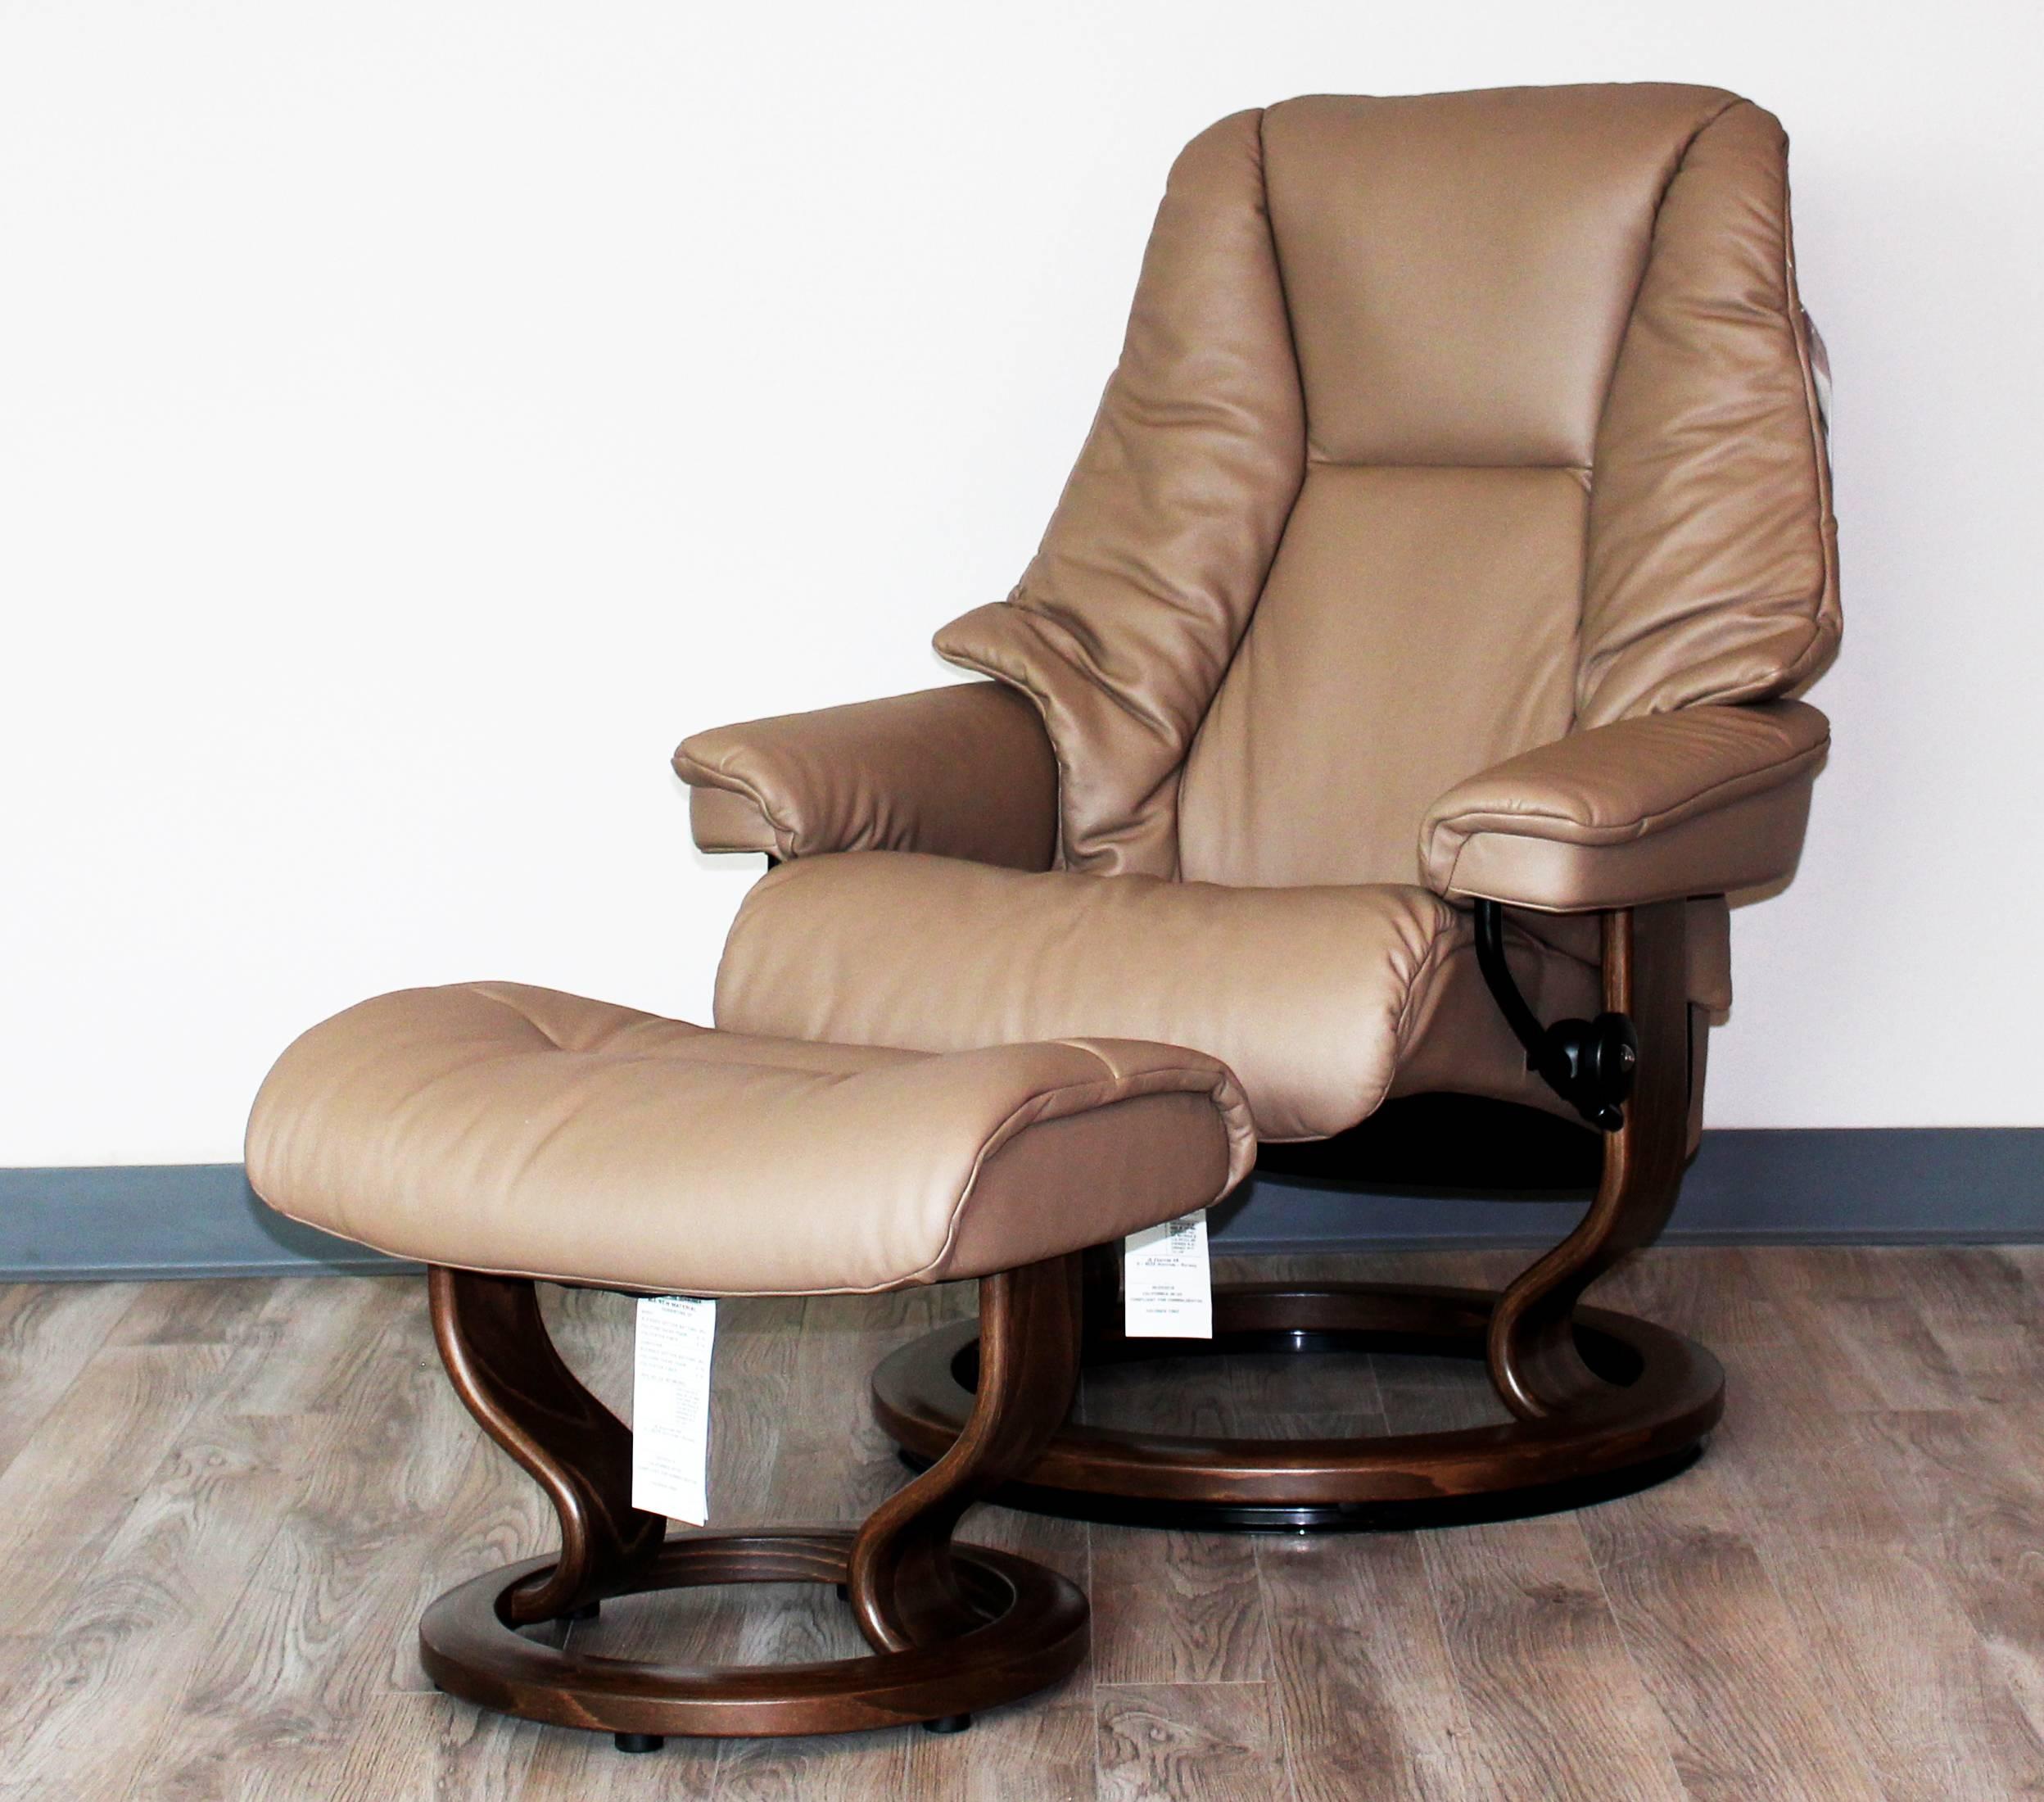 Fullsize Of Ergonomic Chair With Ottoman